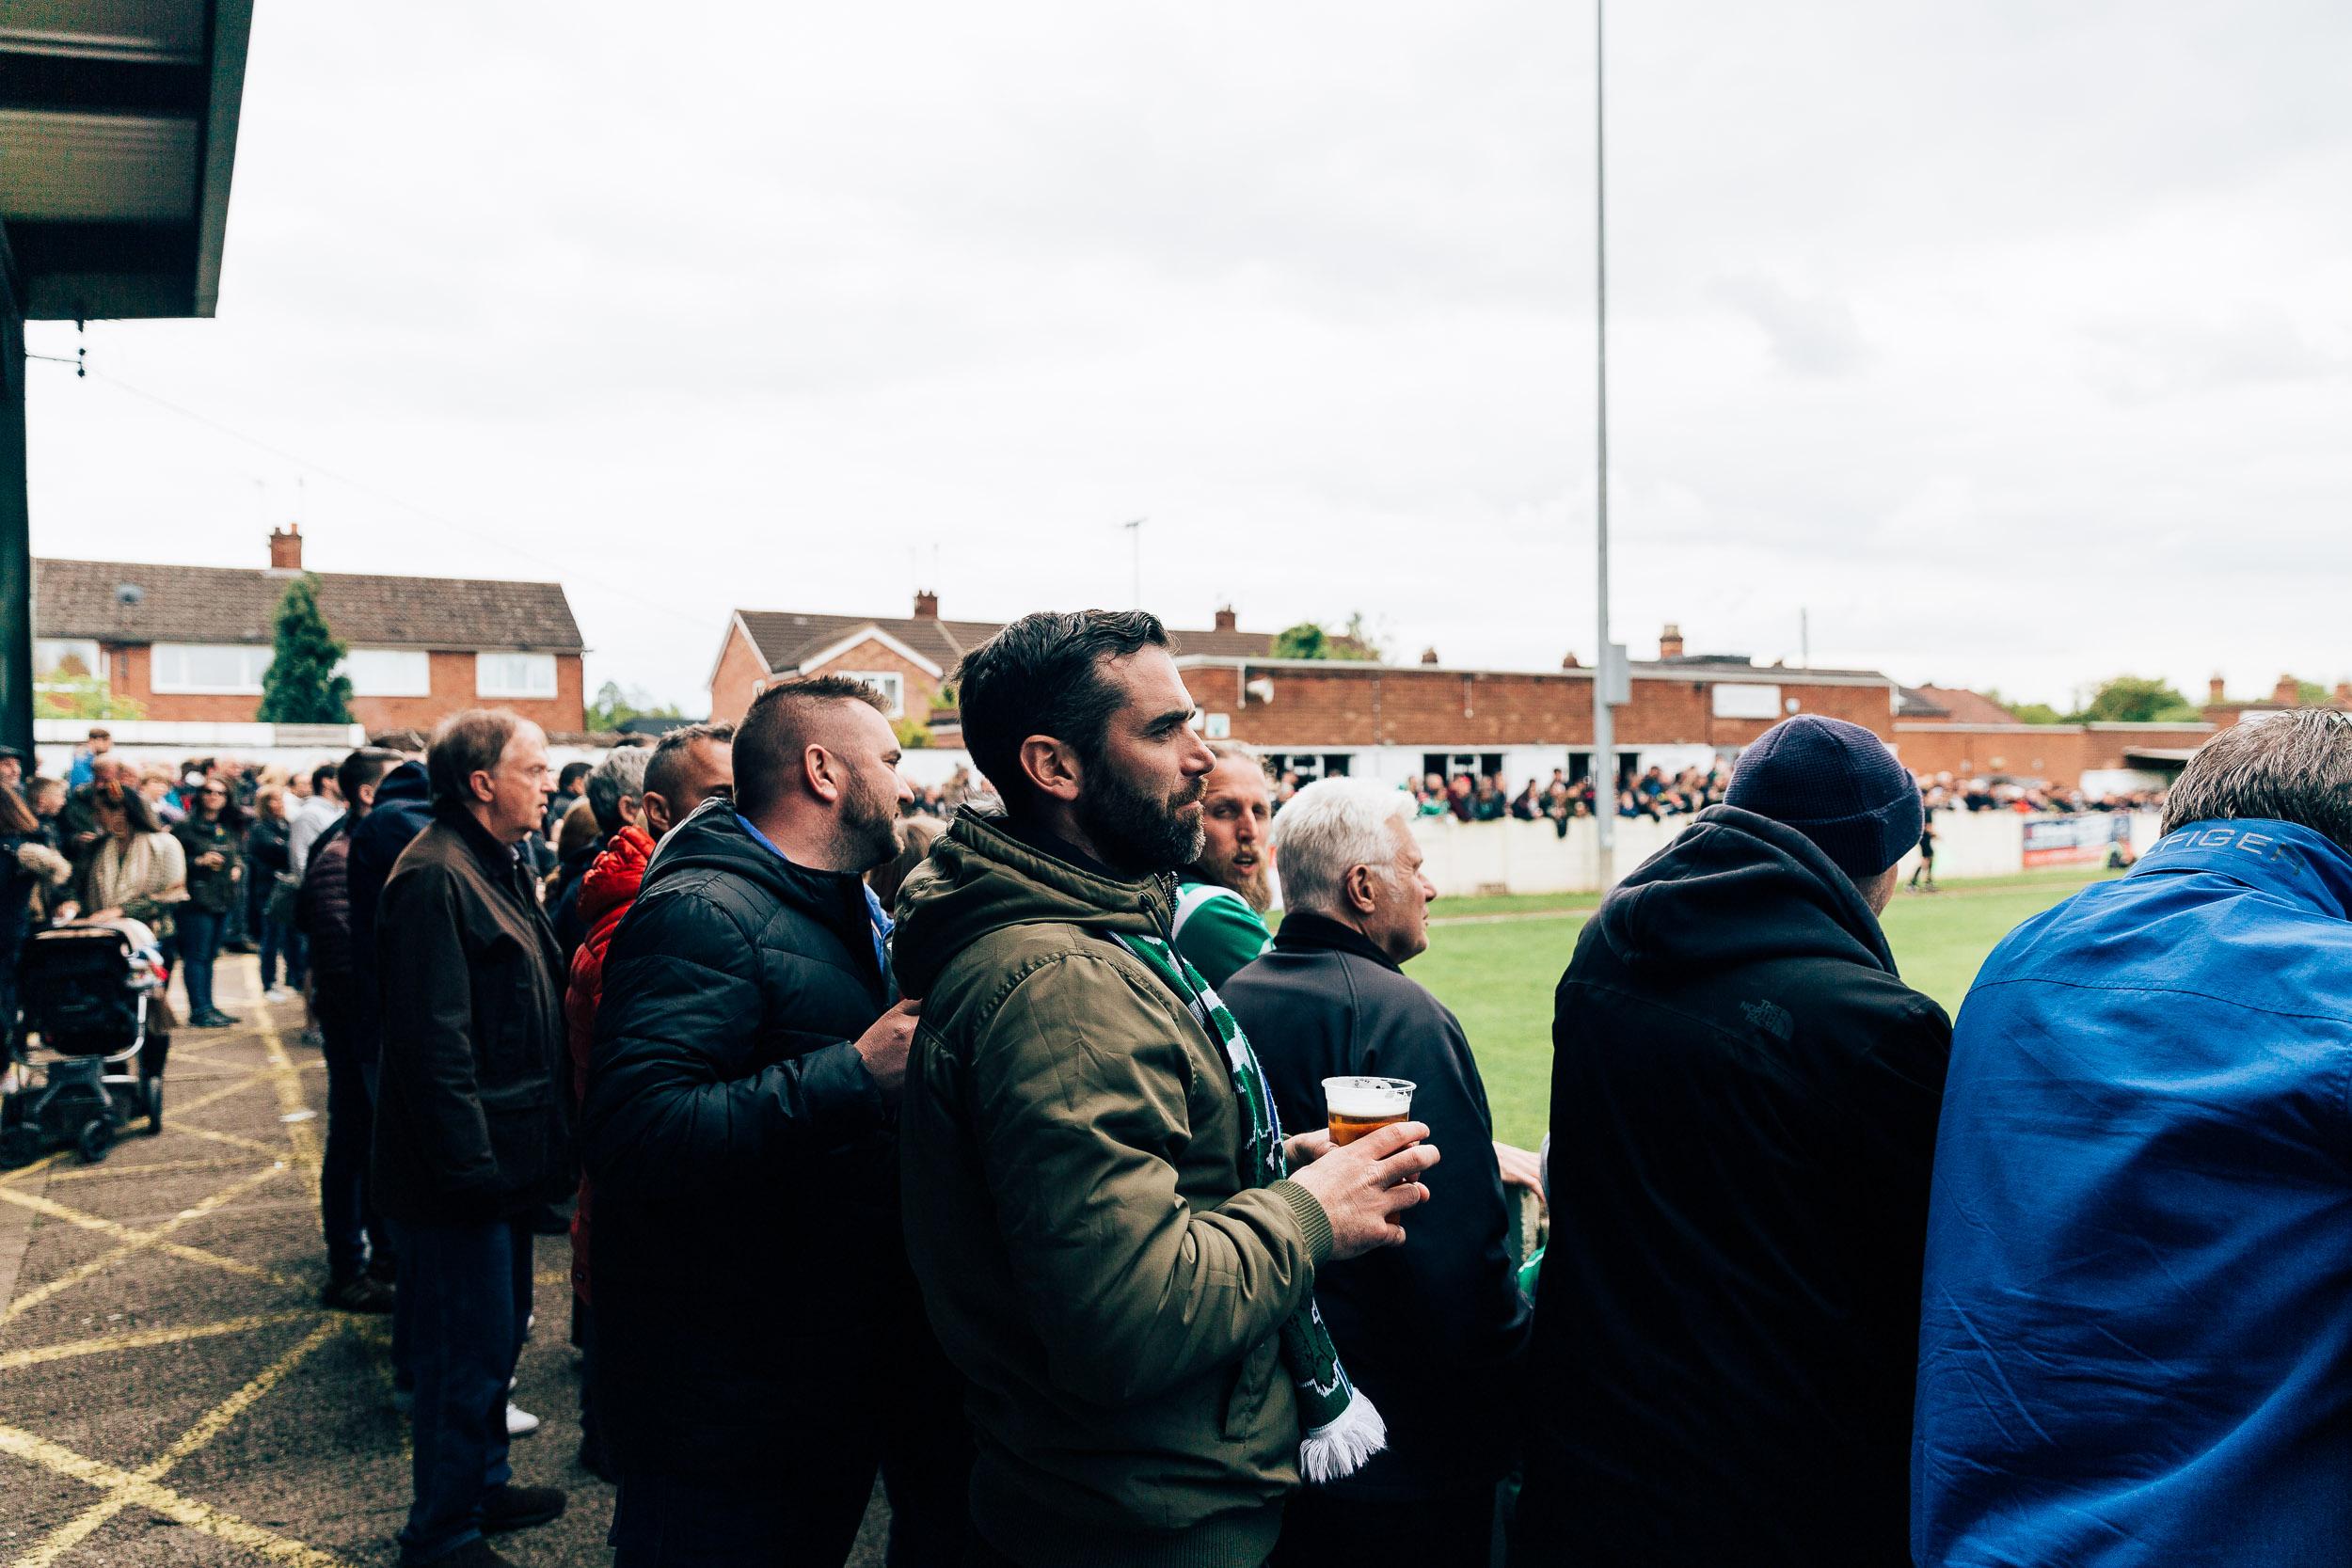 06_05_2019_Bromsgrove_Sporting_Corby-58.jpg